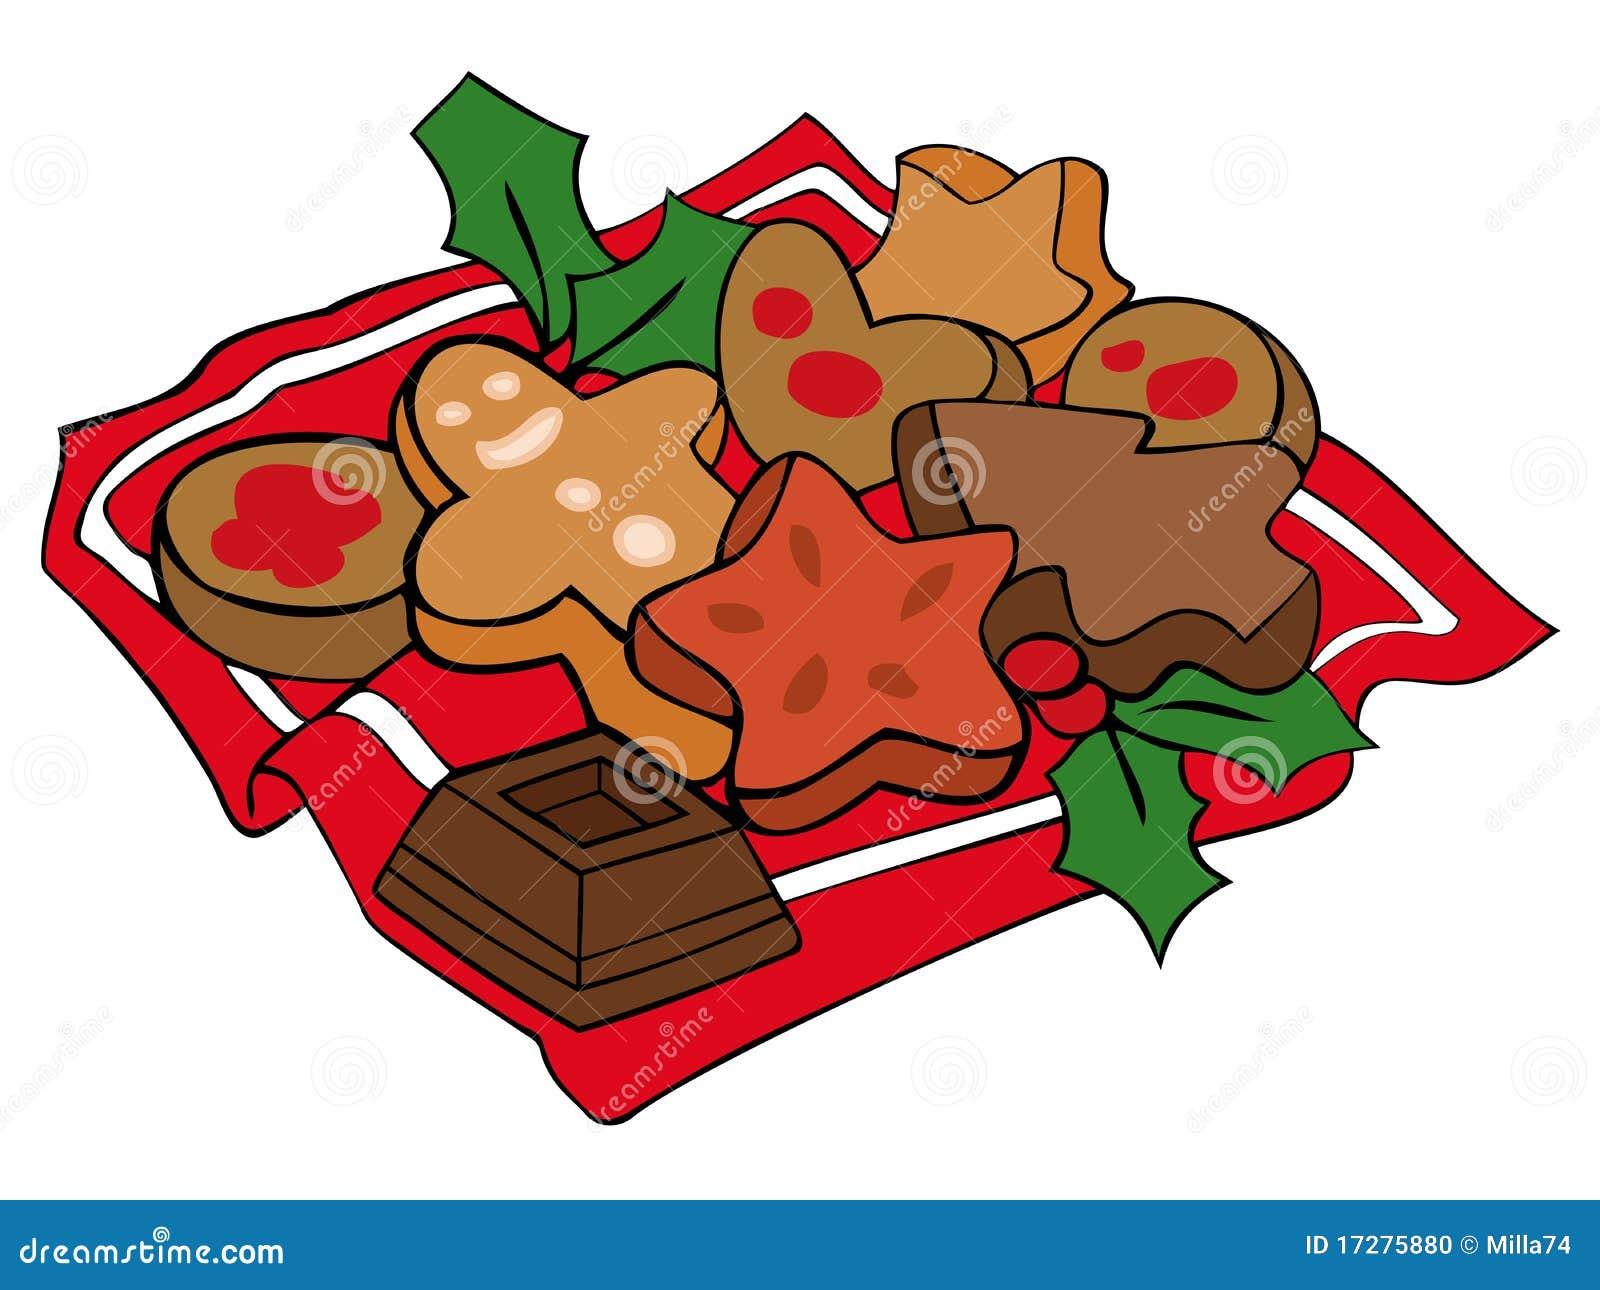 christmas cookies stock vector illustration of biscuit. Black Bedroom Furniture Sets. Home Design Ideas